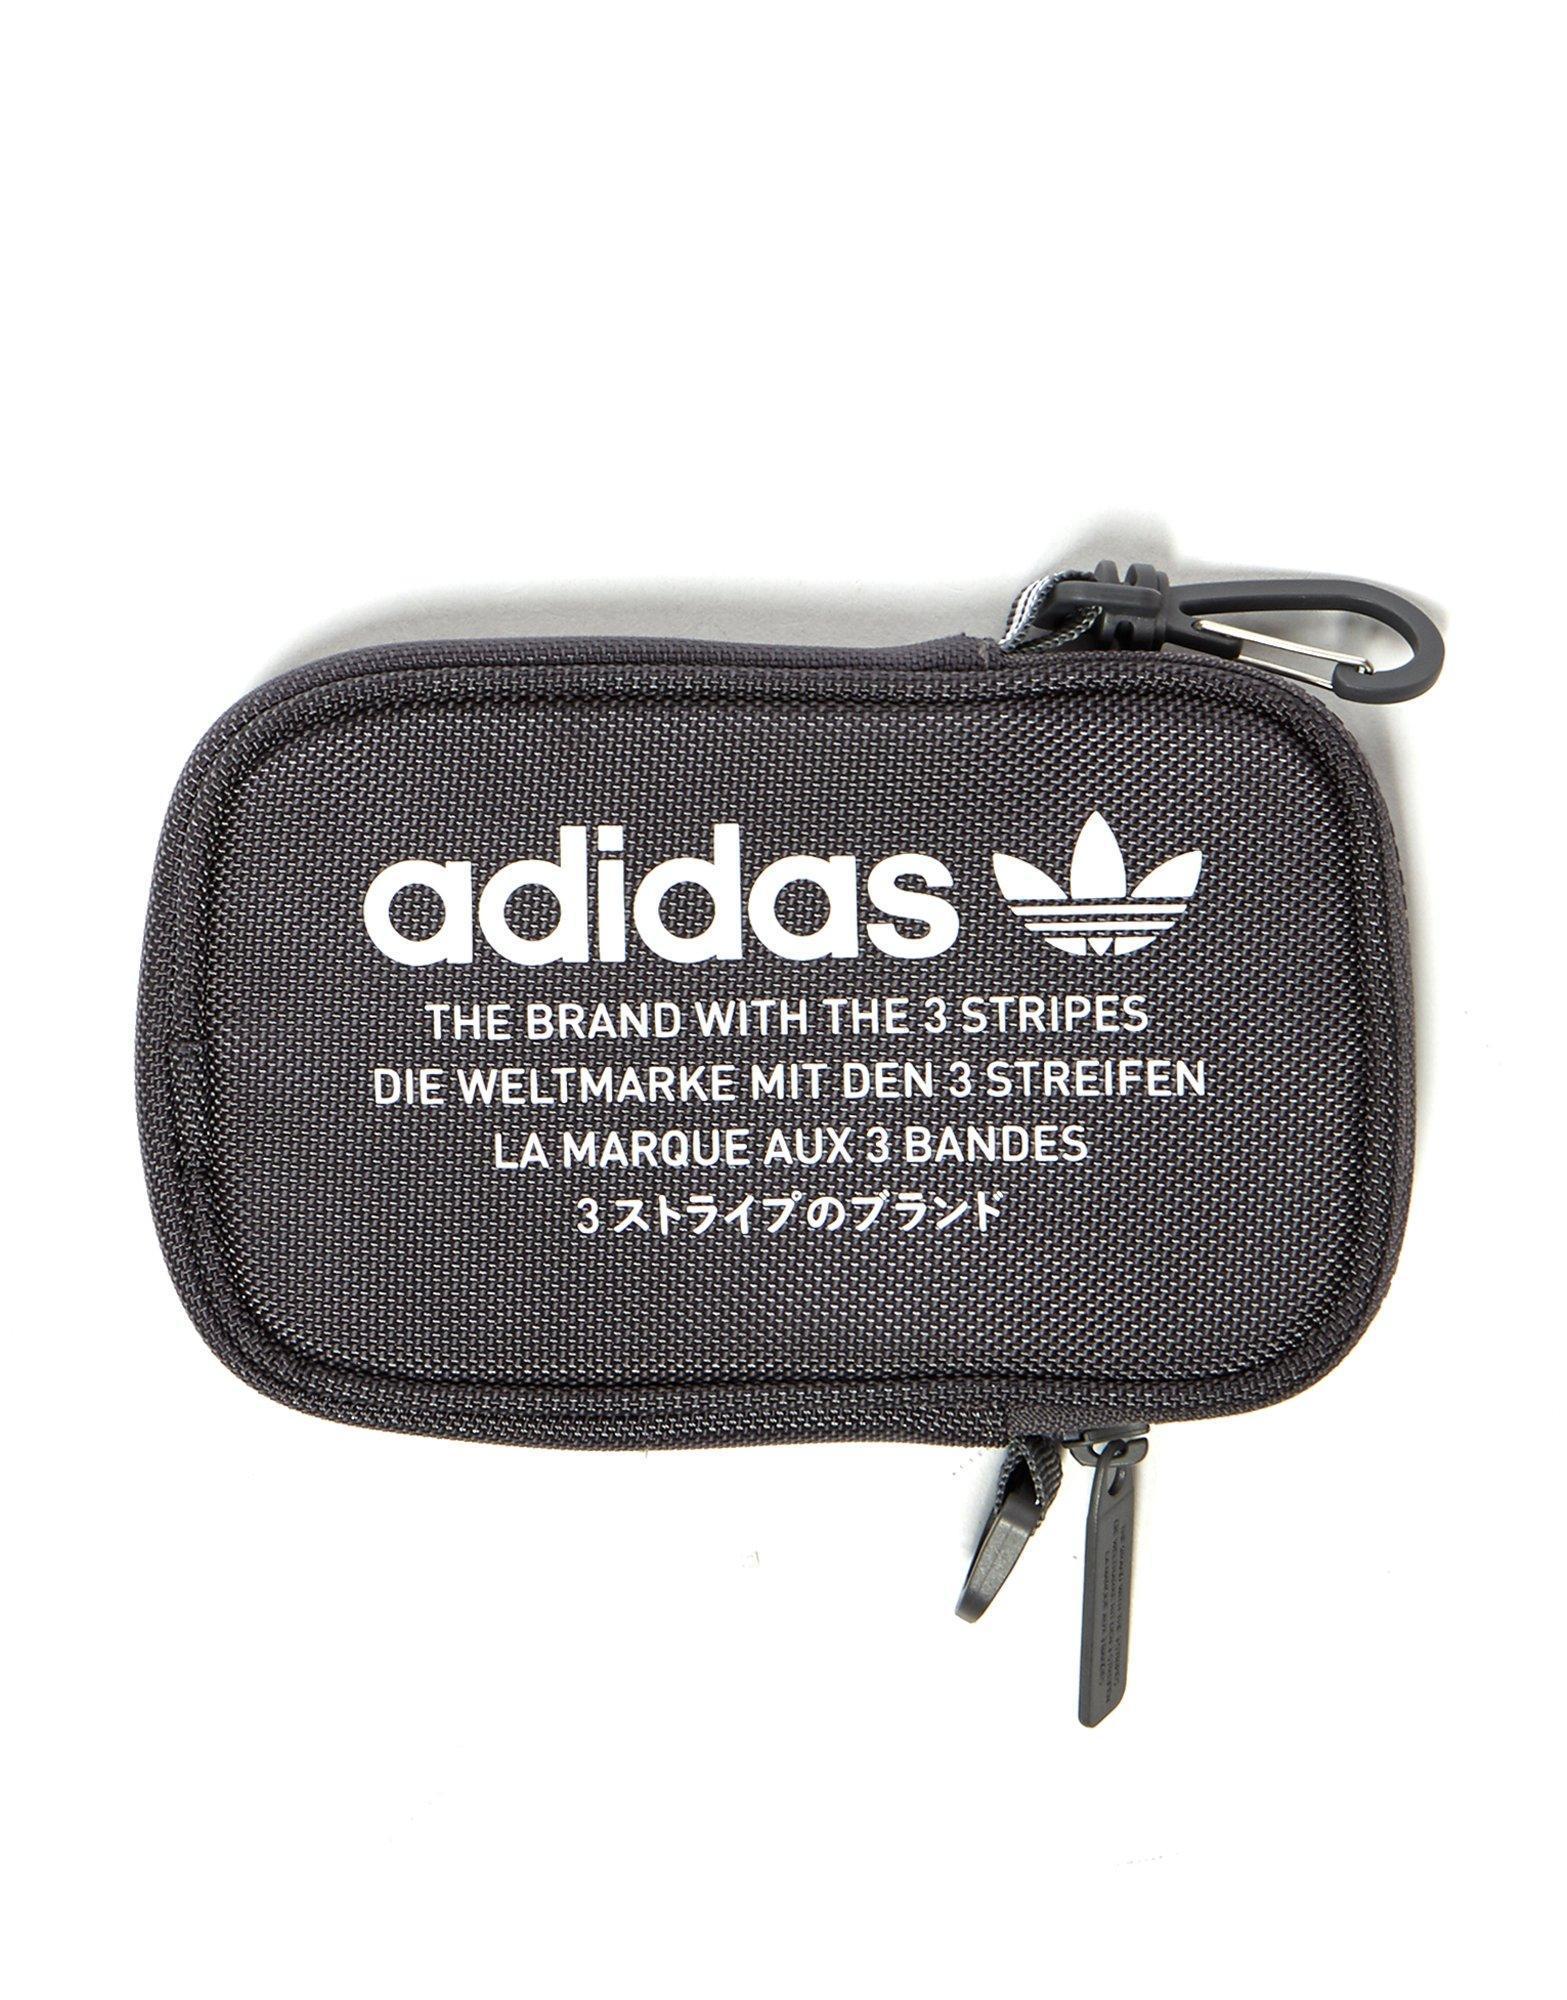 7ae56559baa3 Lyst - adidas Originals Festival Nmd Bag in Gray for Men